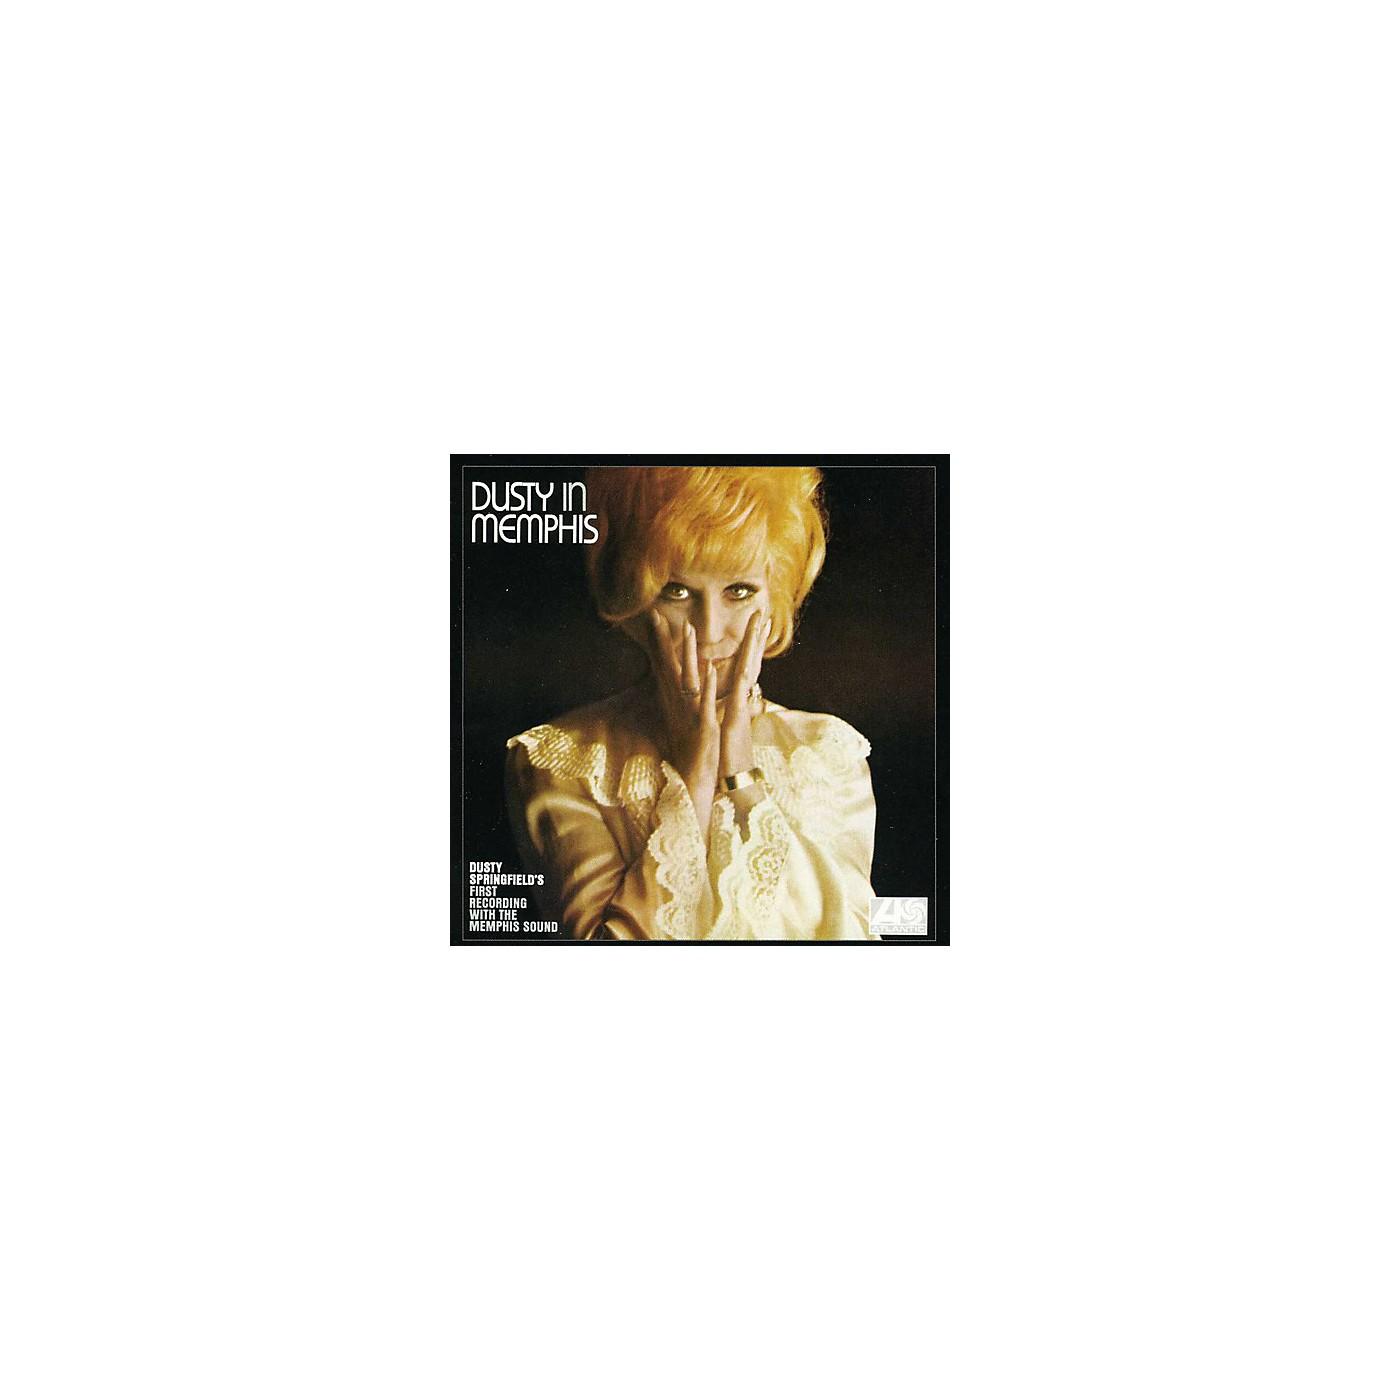 Alliance Dusty Springfield - Dusty in Memphis (CD) thumbnail